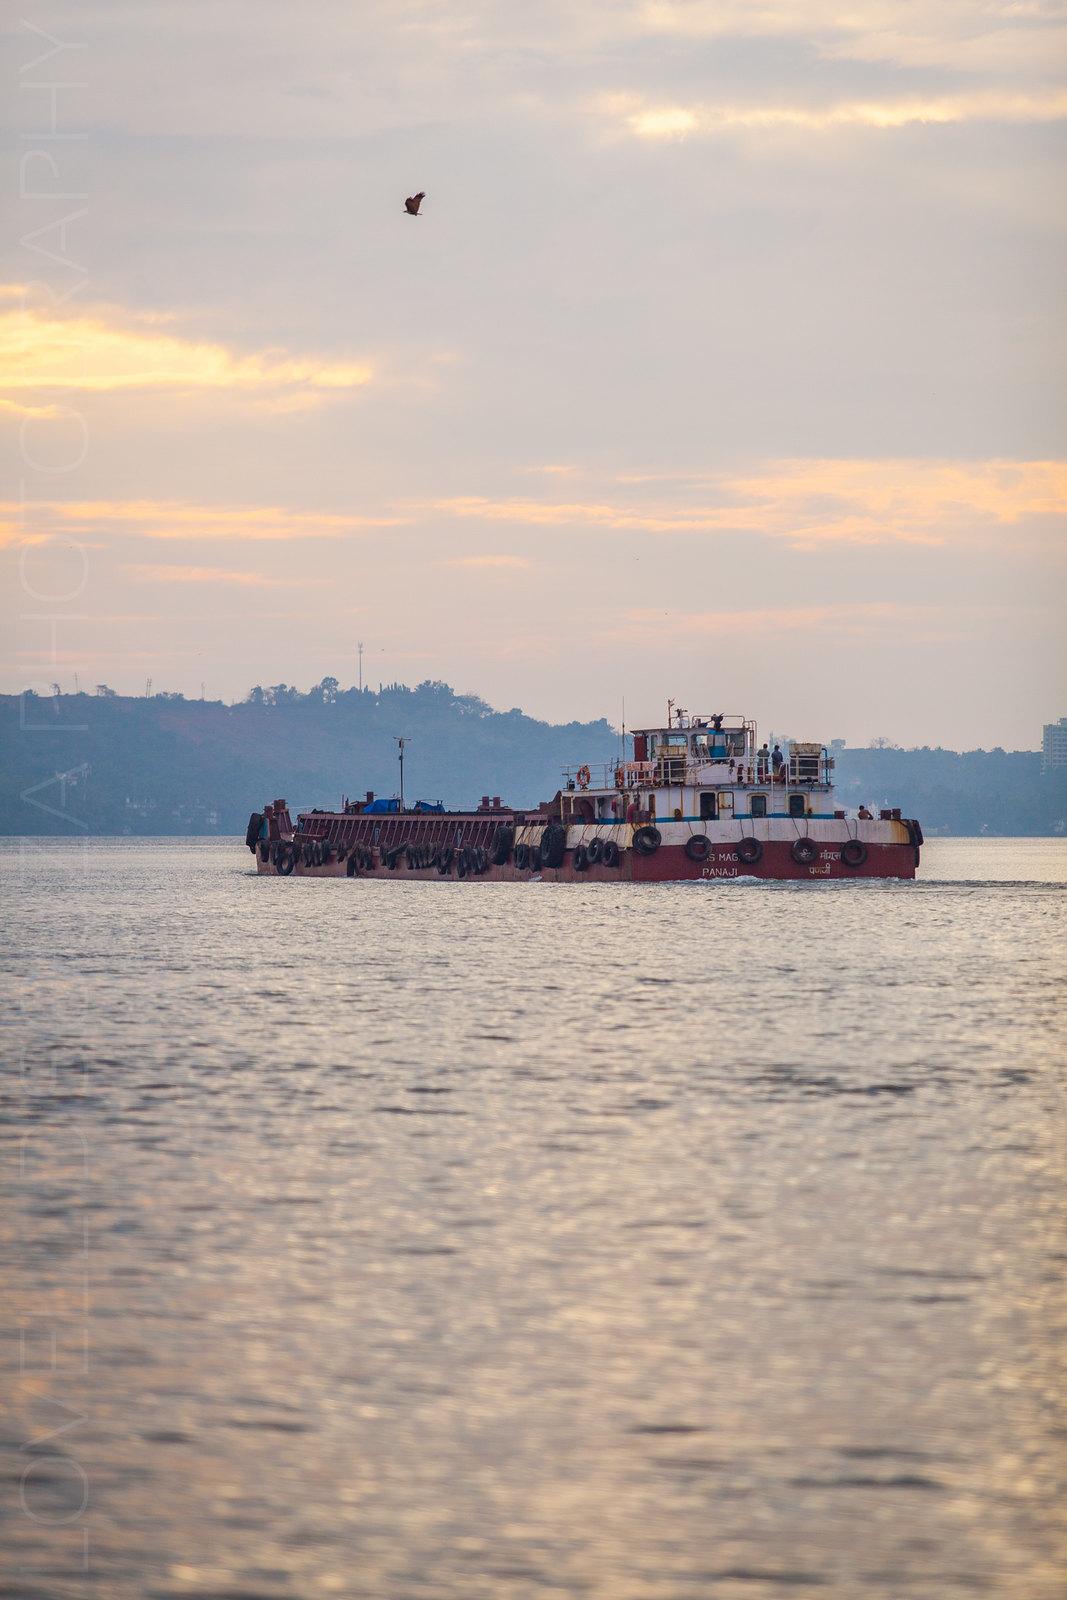 Barge on the Mandovi River